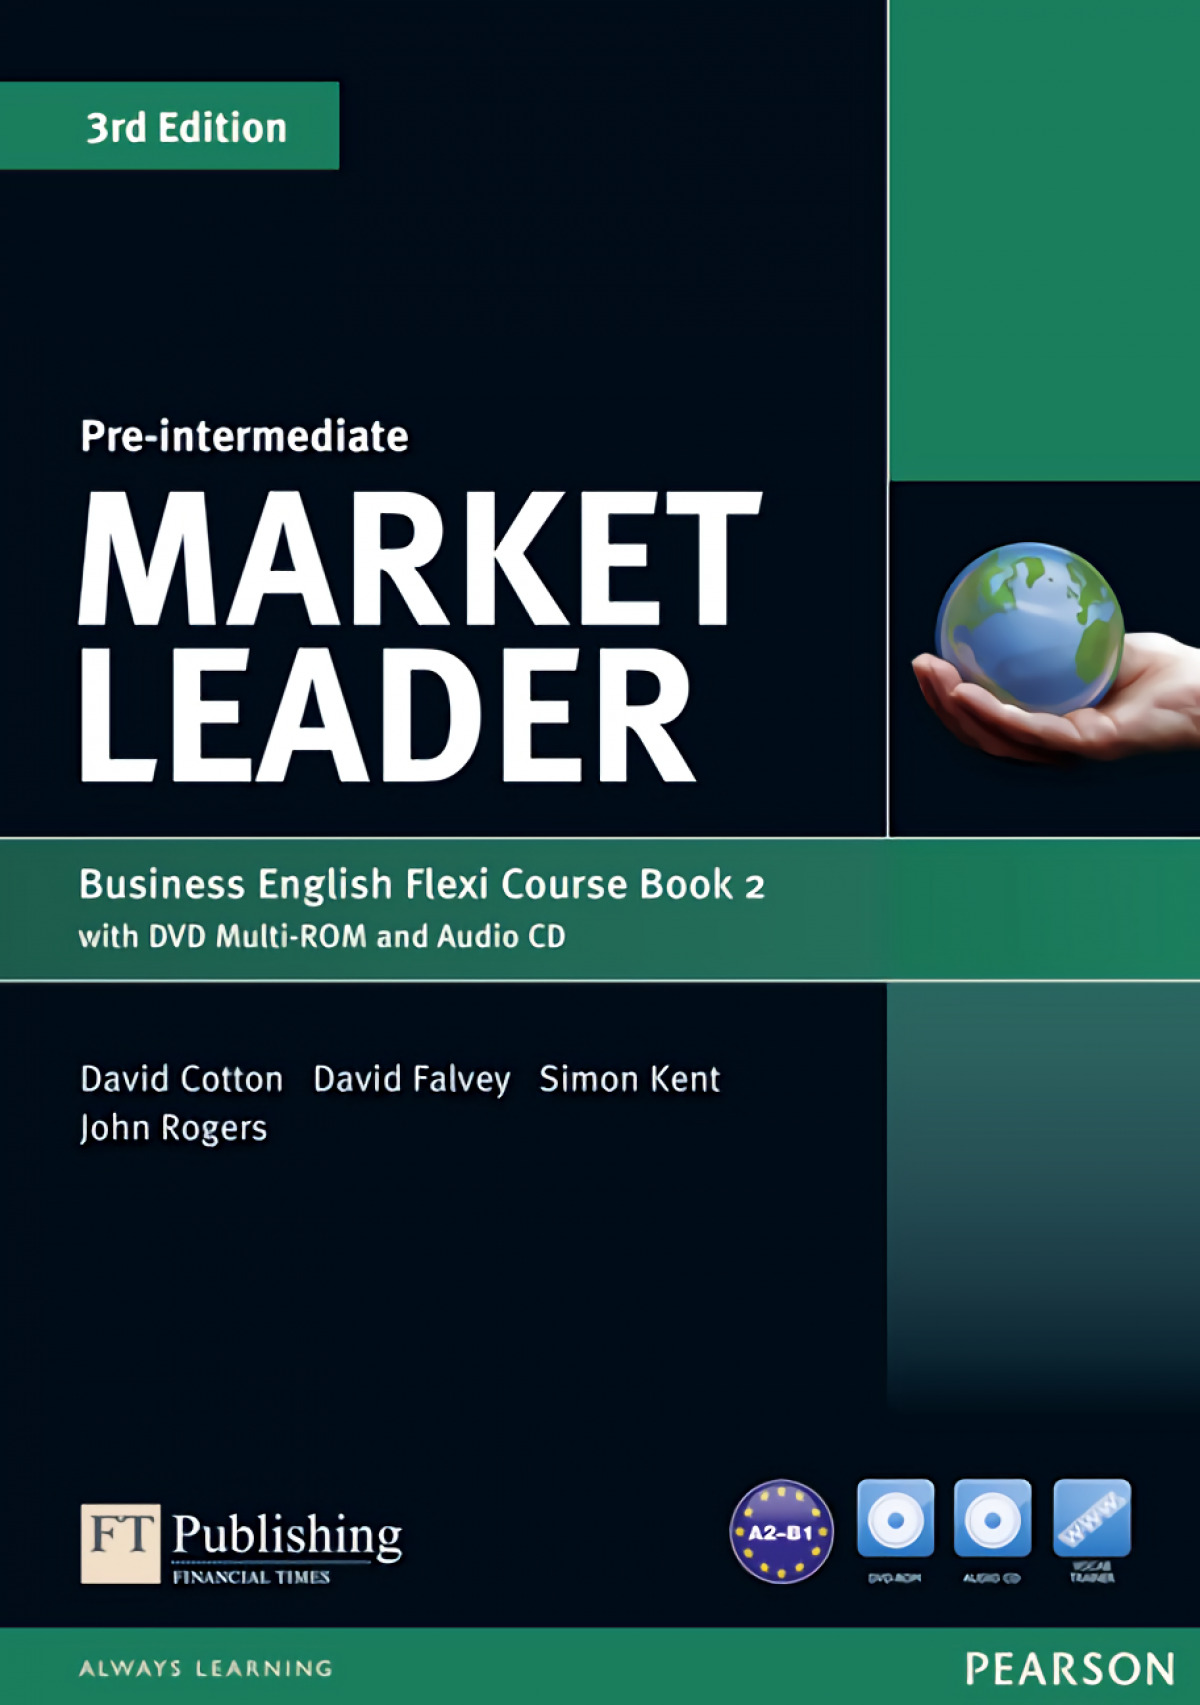 market leader pre-intermediate flexi 2 coursebook pack